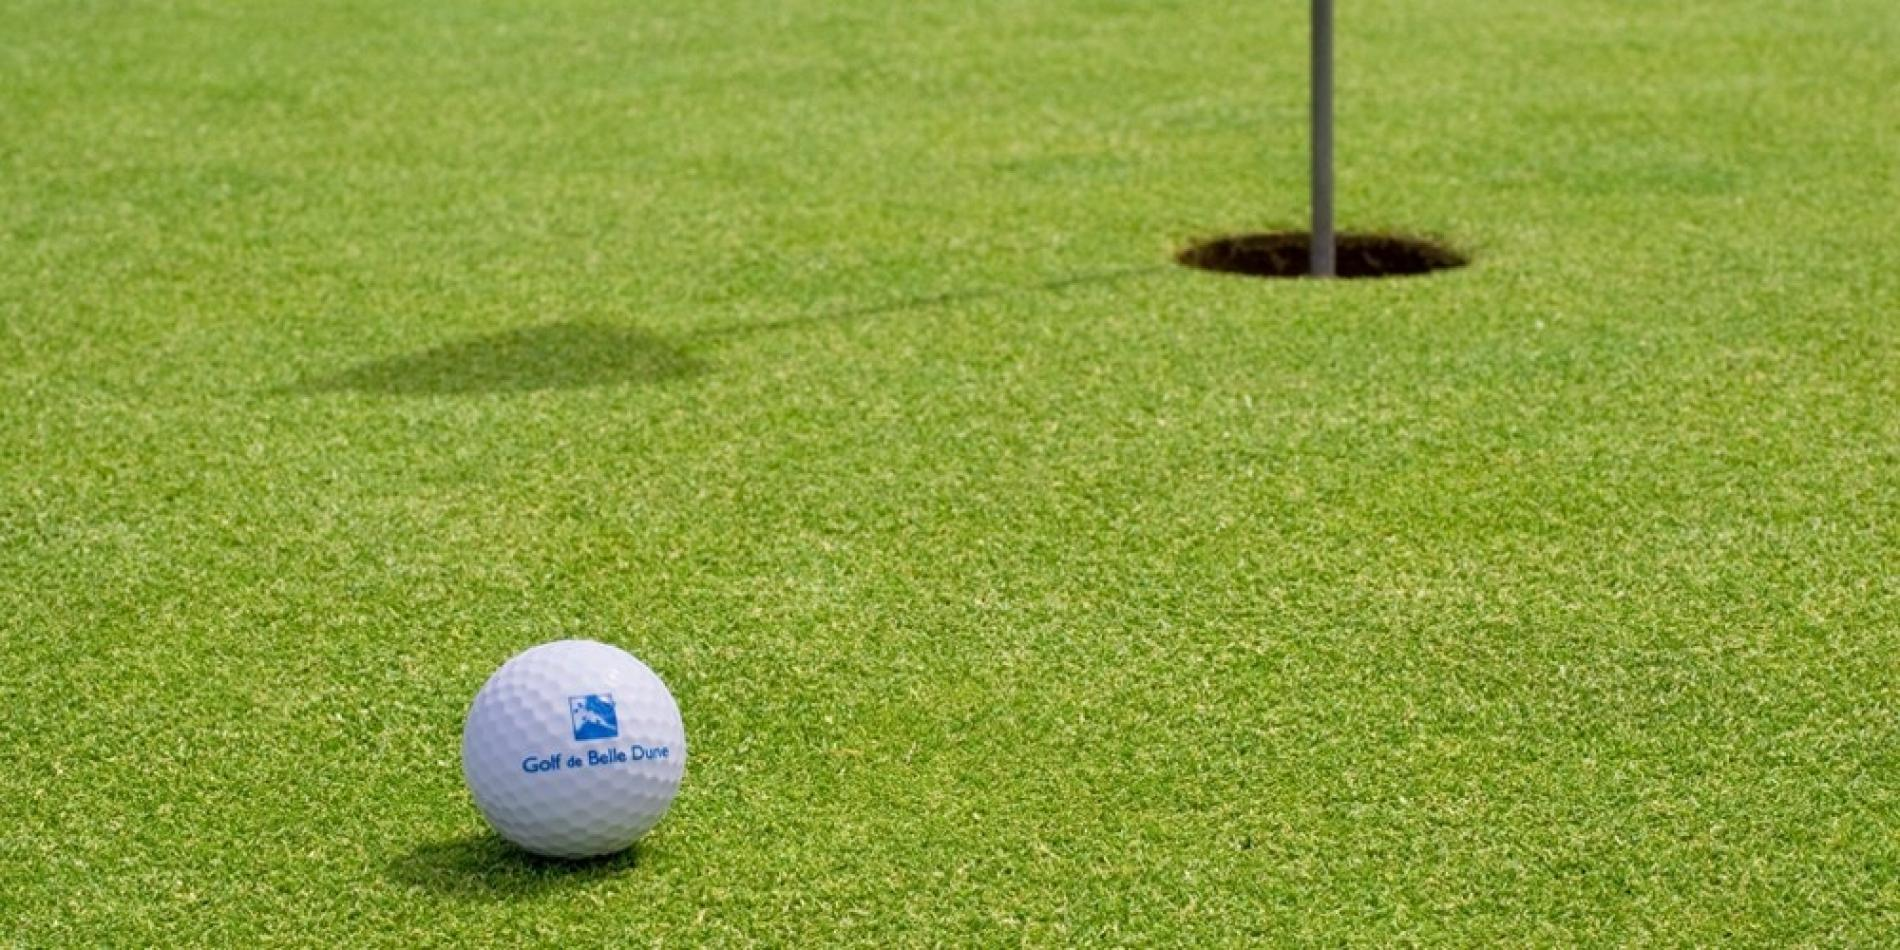 Belle Dune golf course